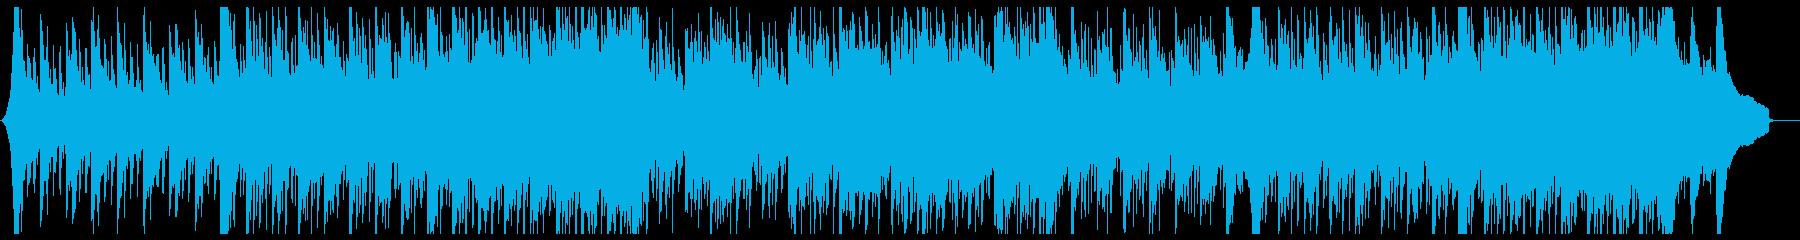 【CM・企業VP】和風・四つ打ちの再生済みの波形